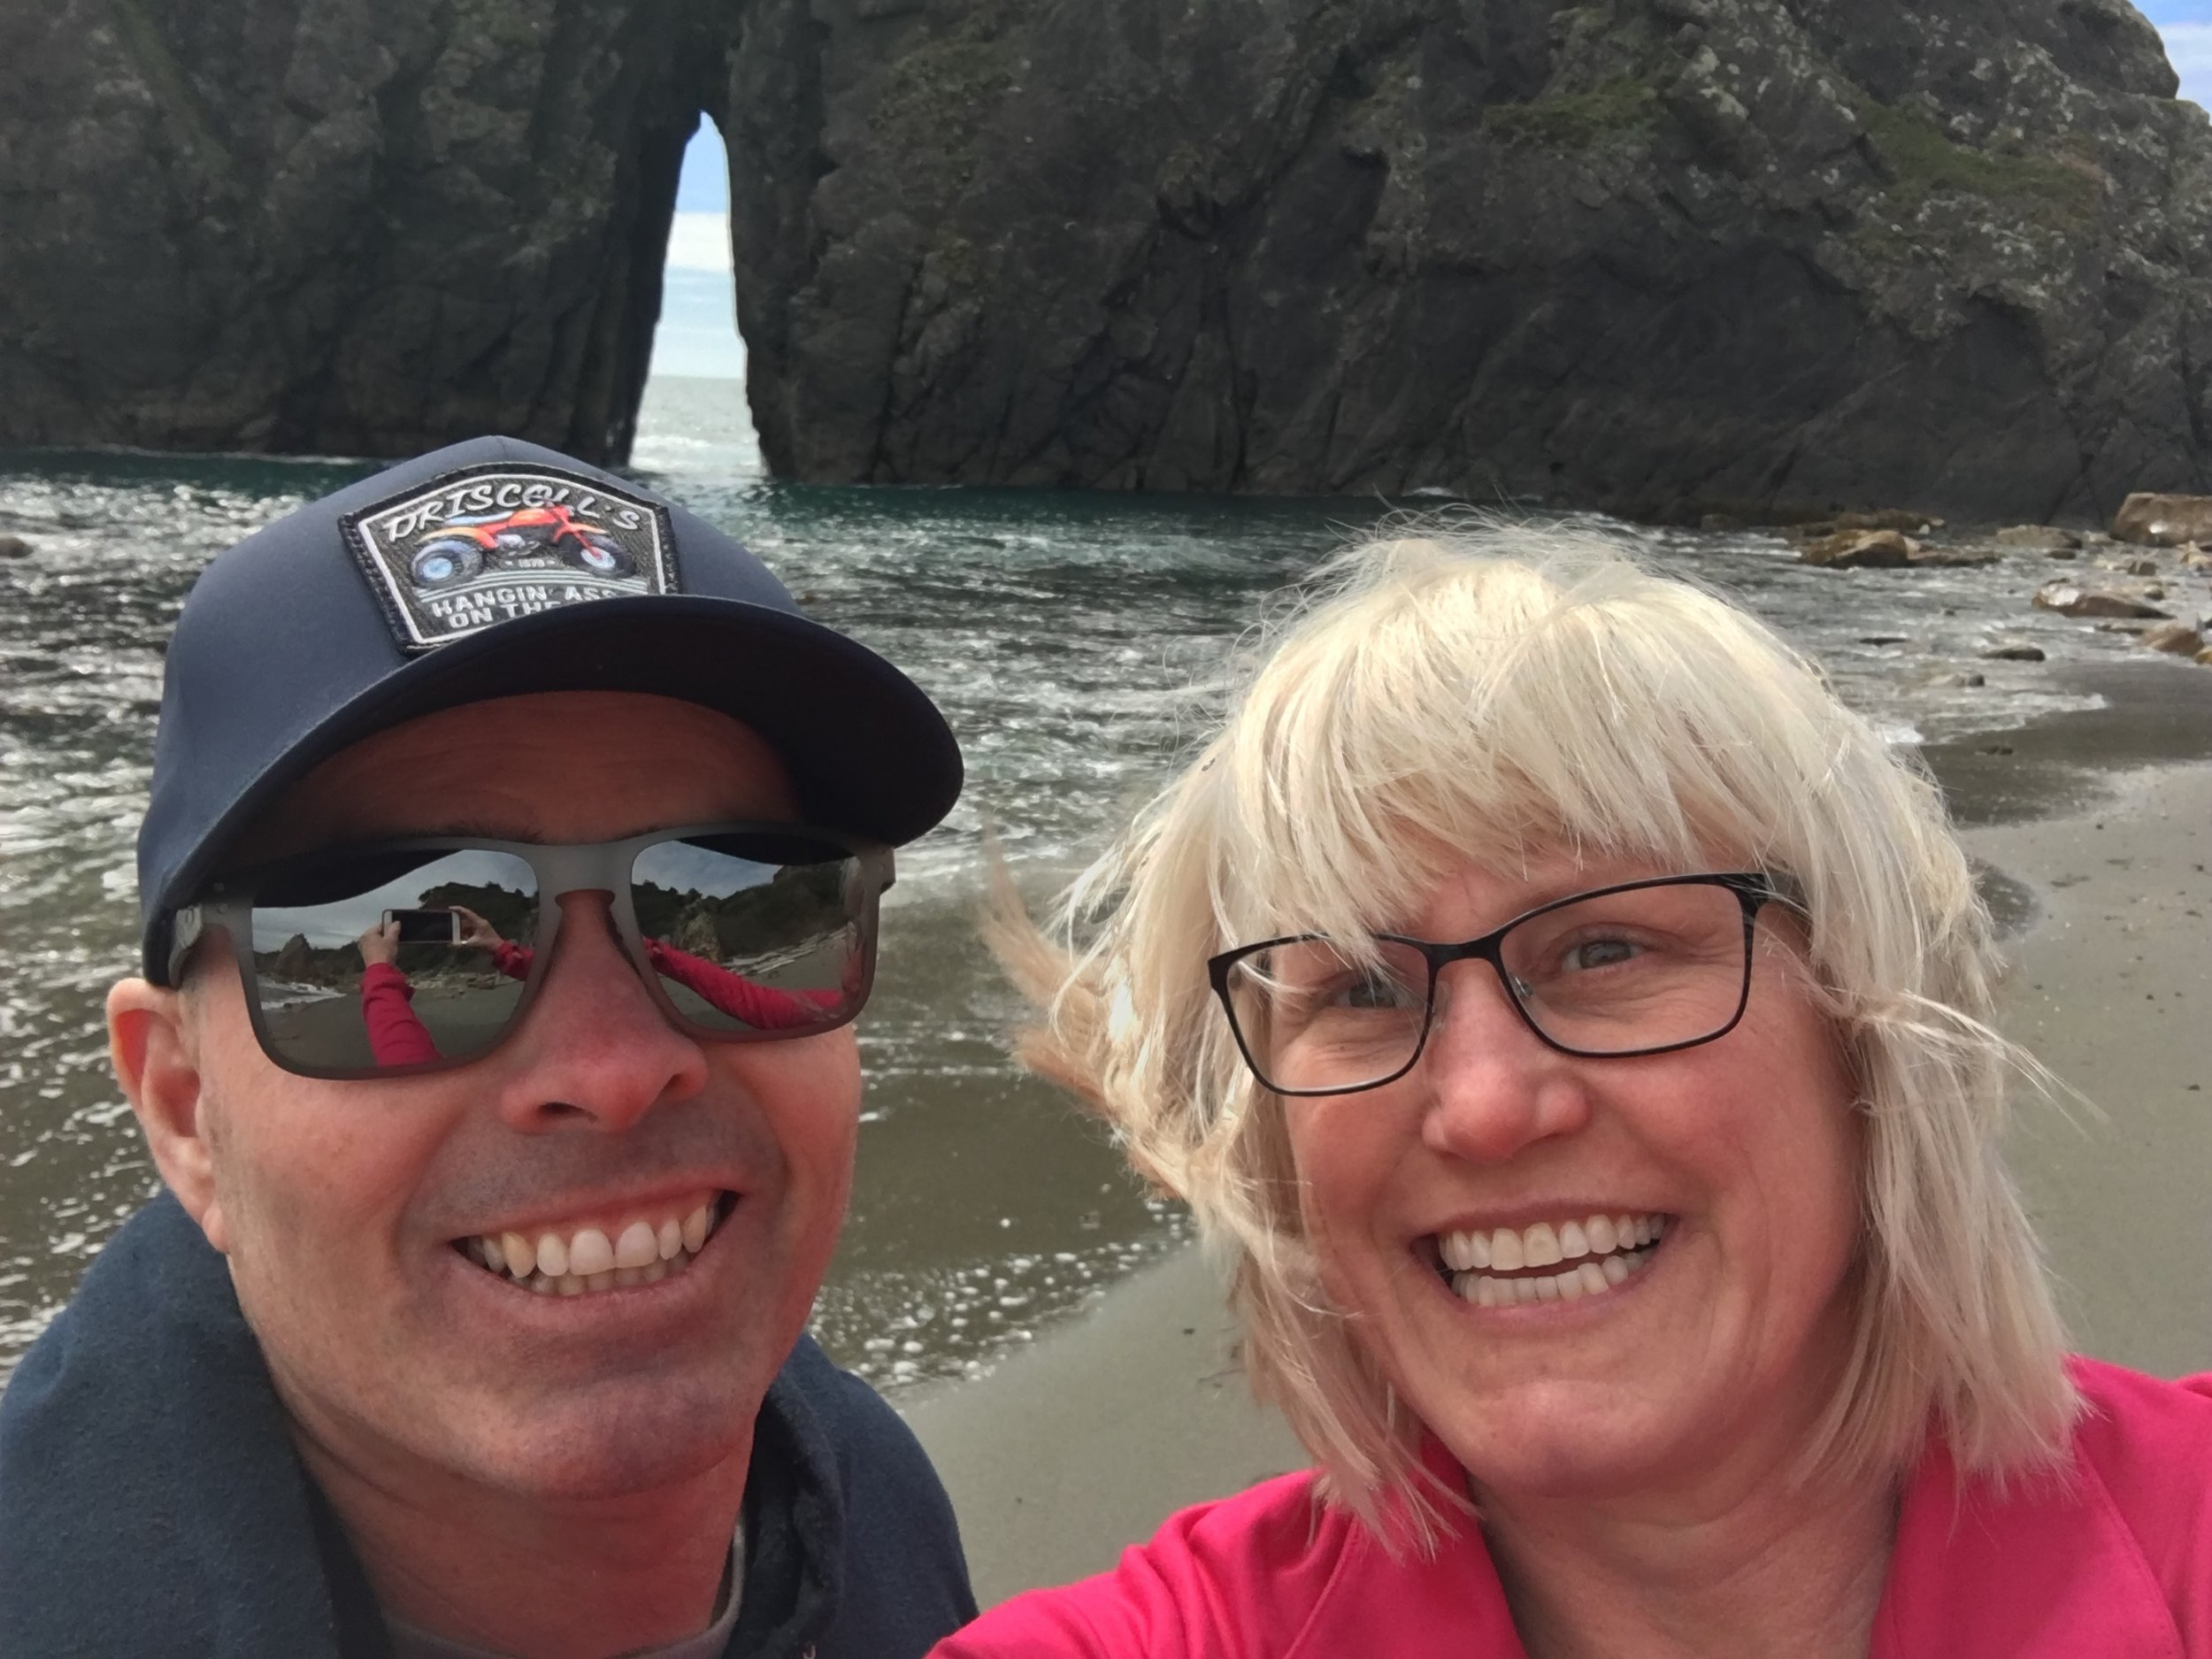 Gotta do an ocean selfie! Brookings, OR.